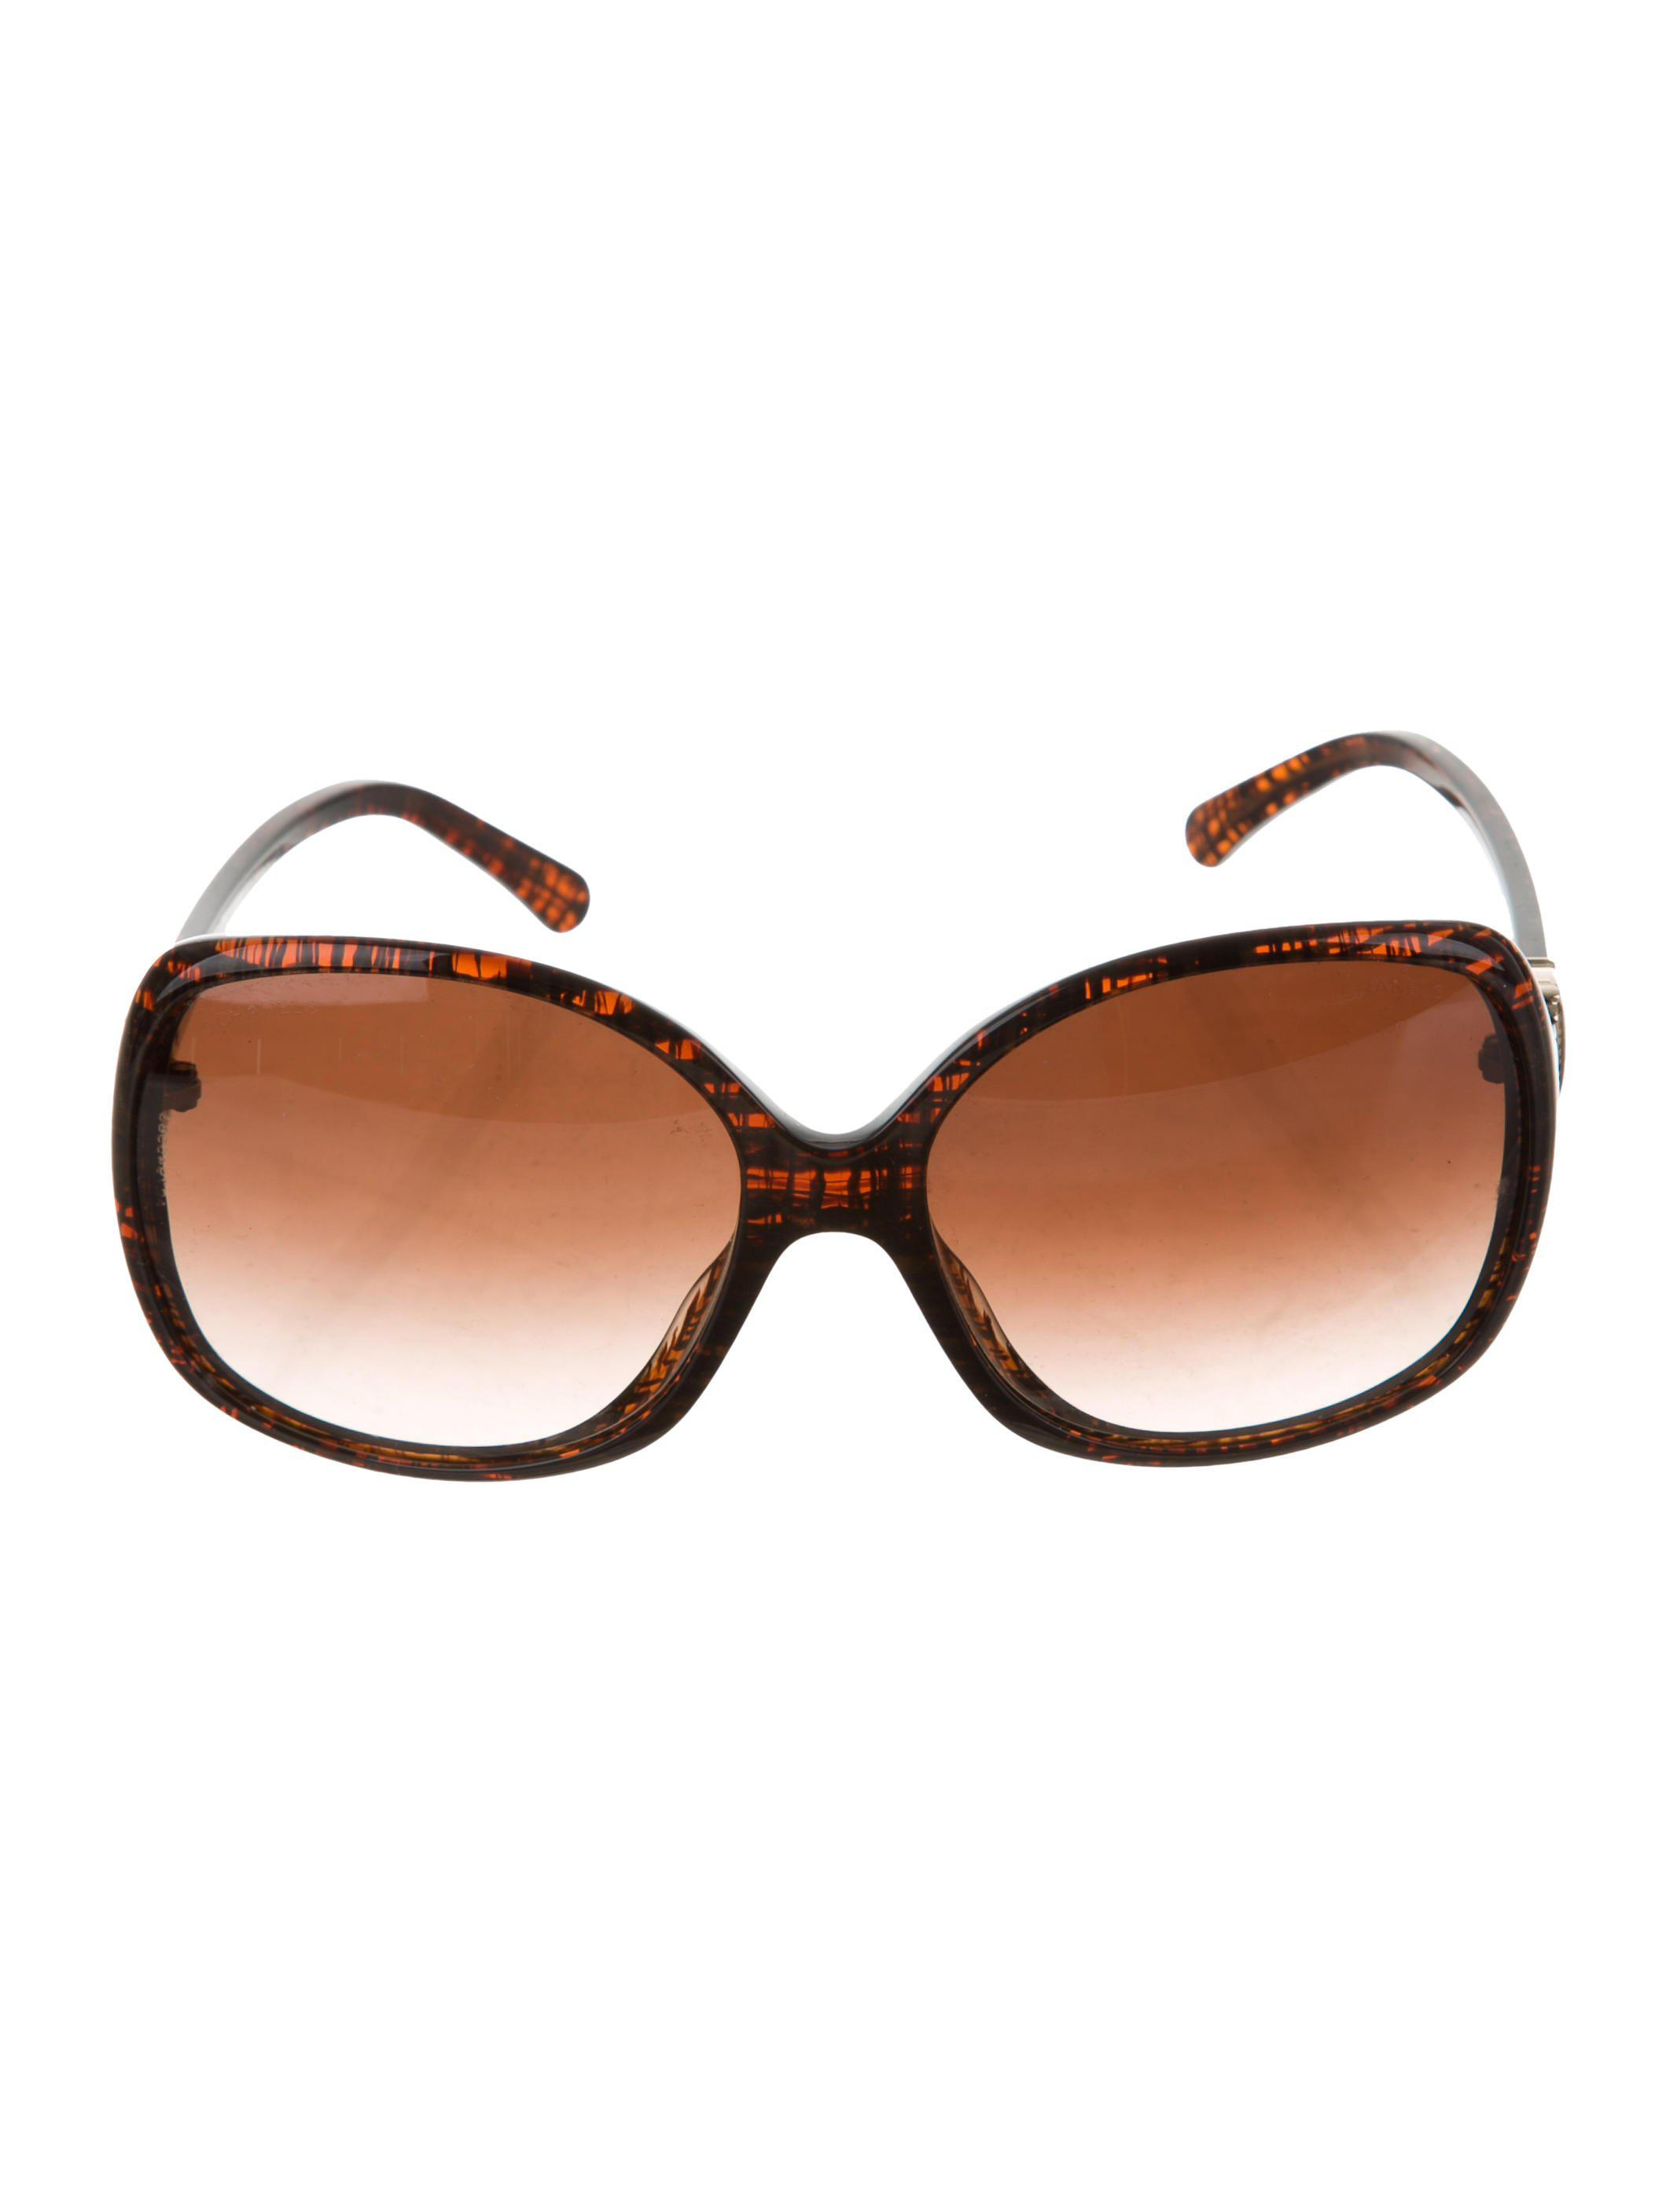 196cbda6b8a Lyst - Chanel Cc Oversize Sunglasses Brown in Metallic